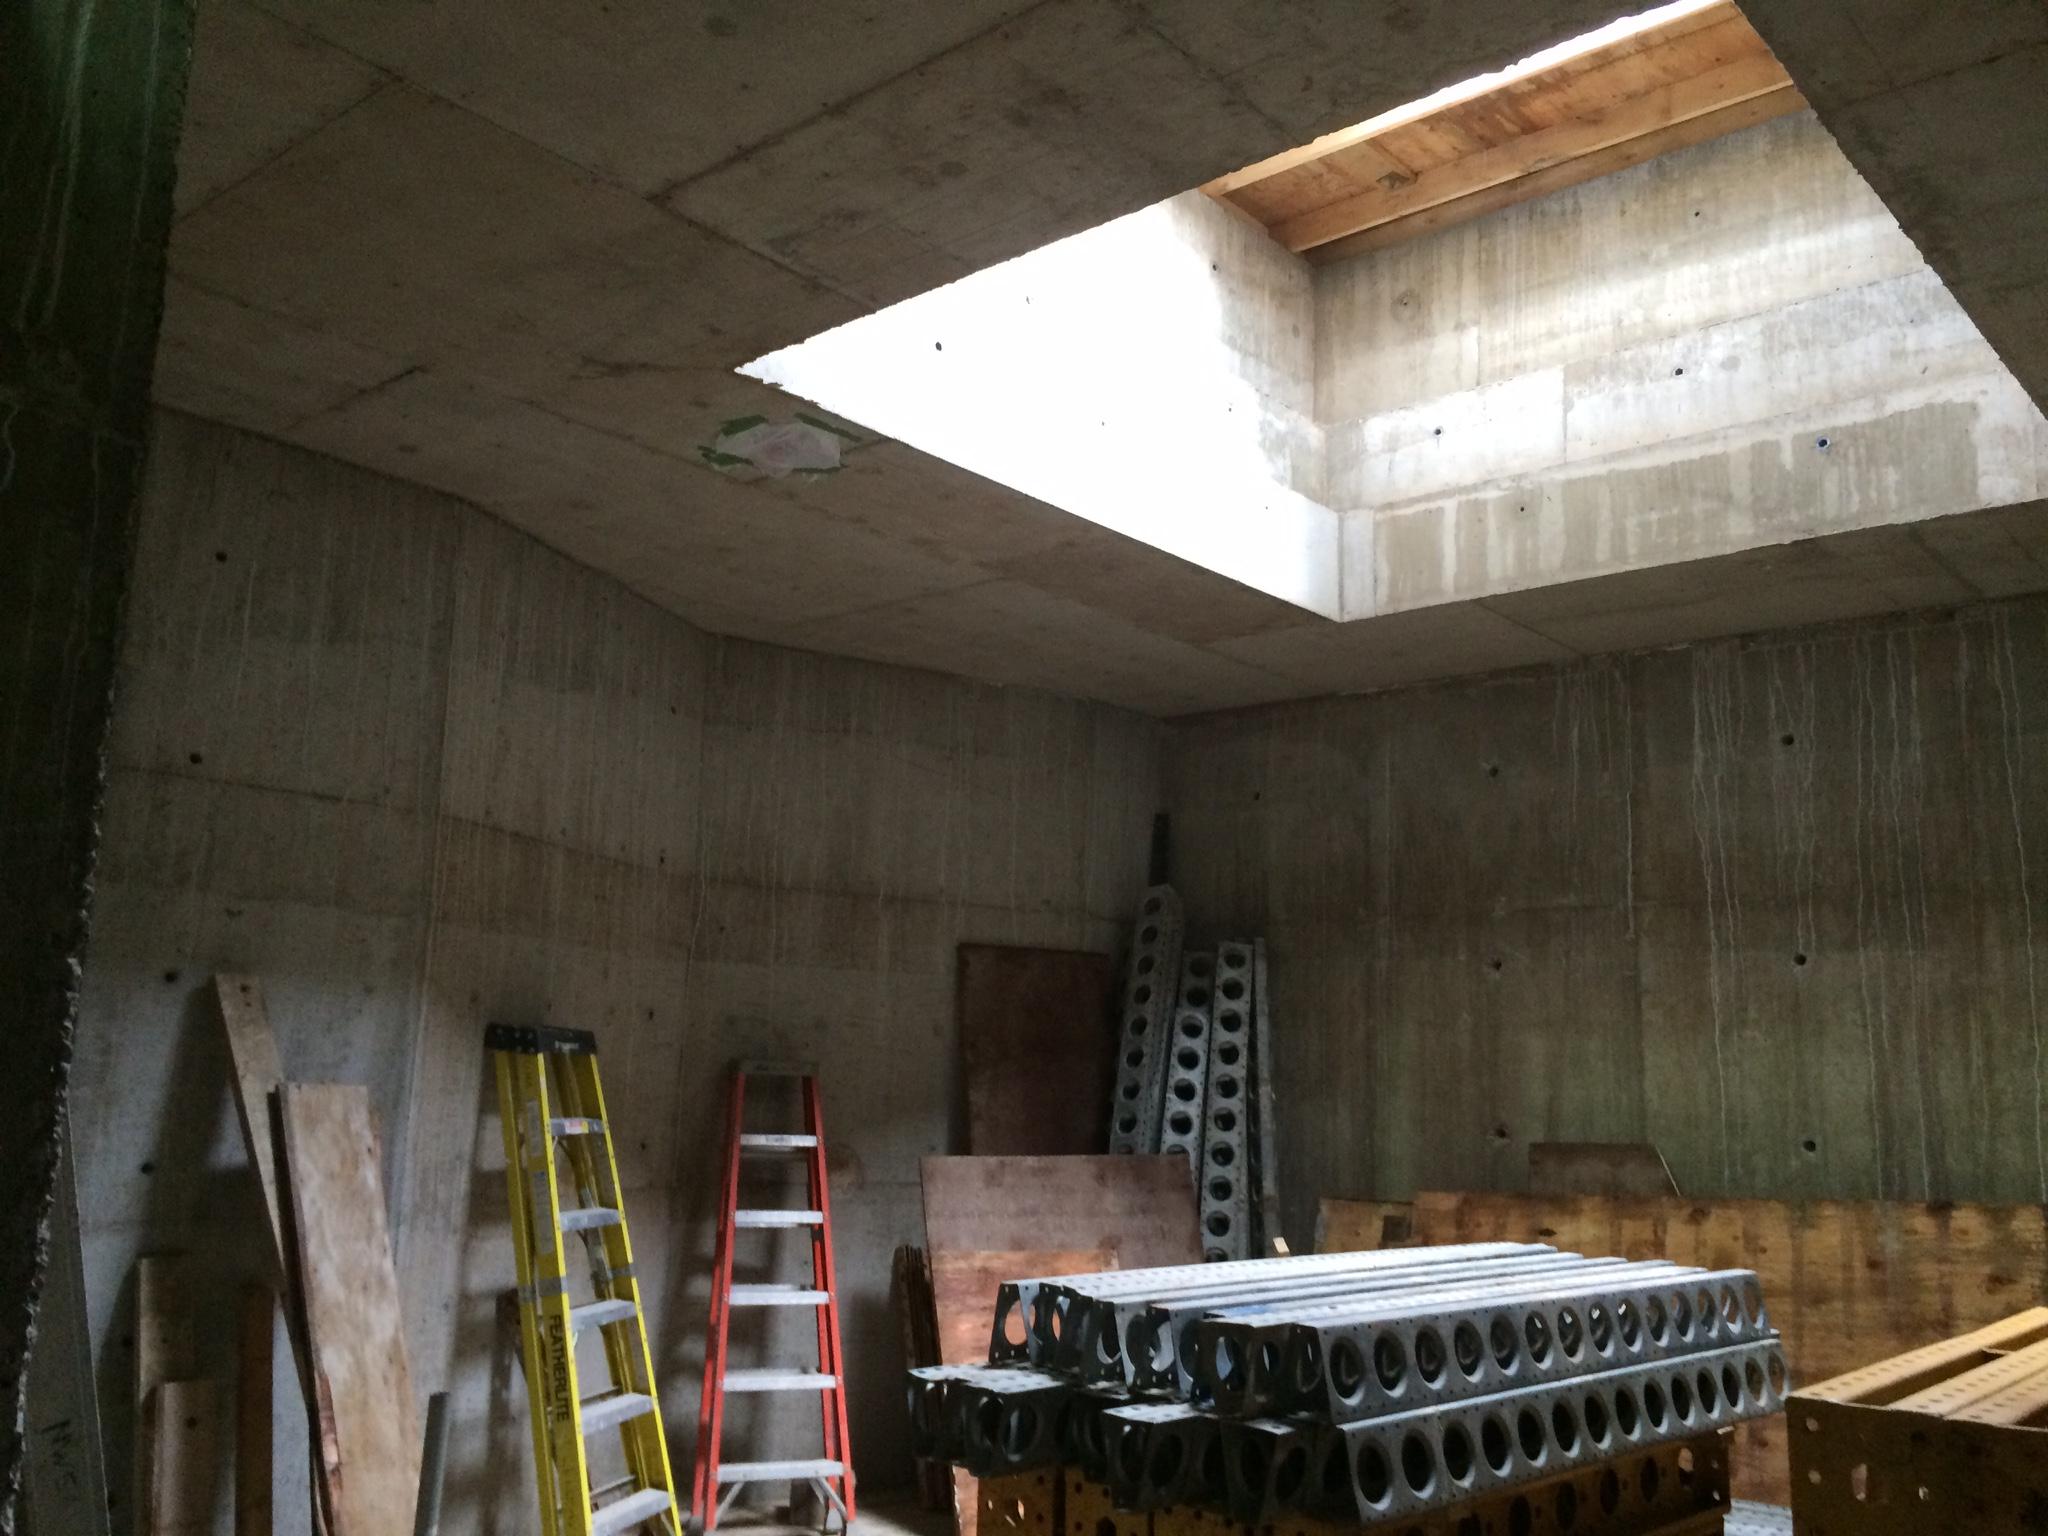 Bunker under construction